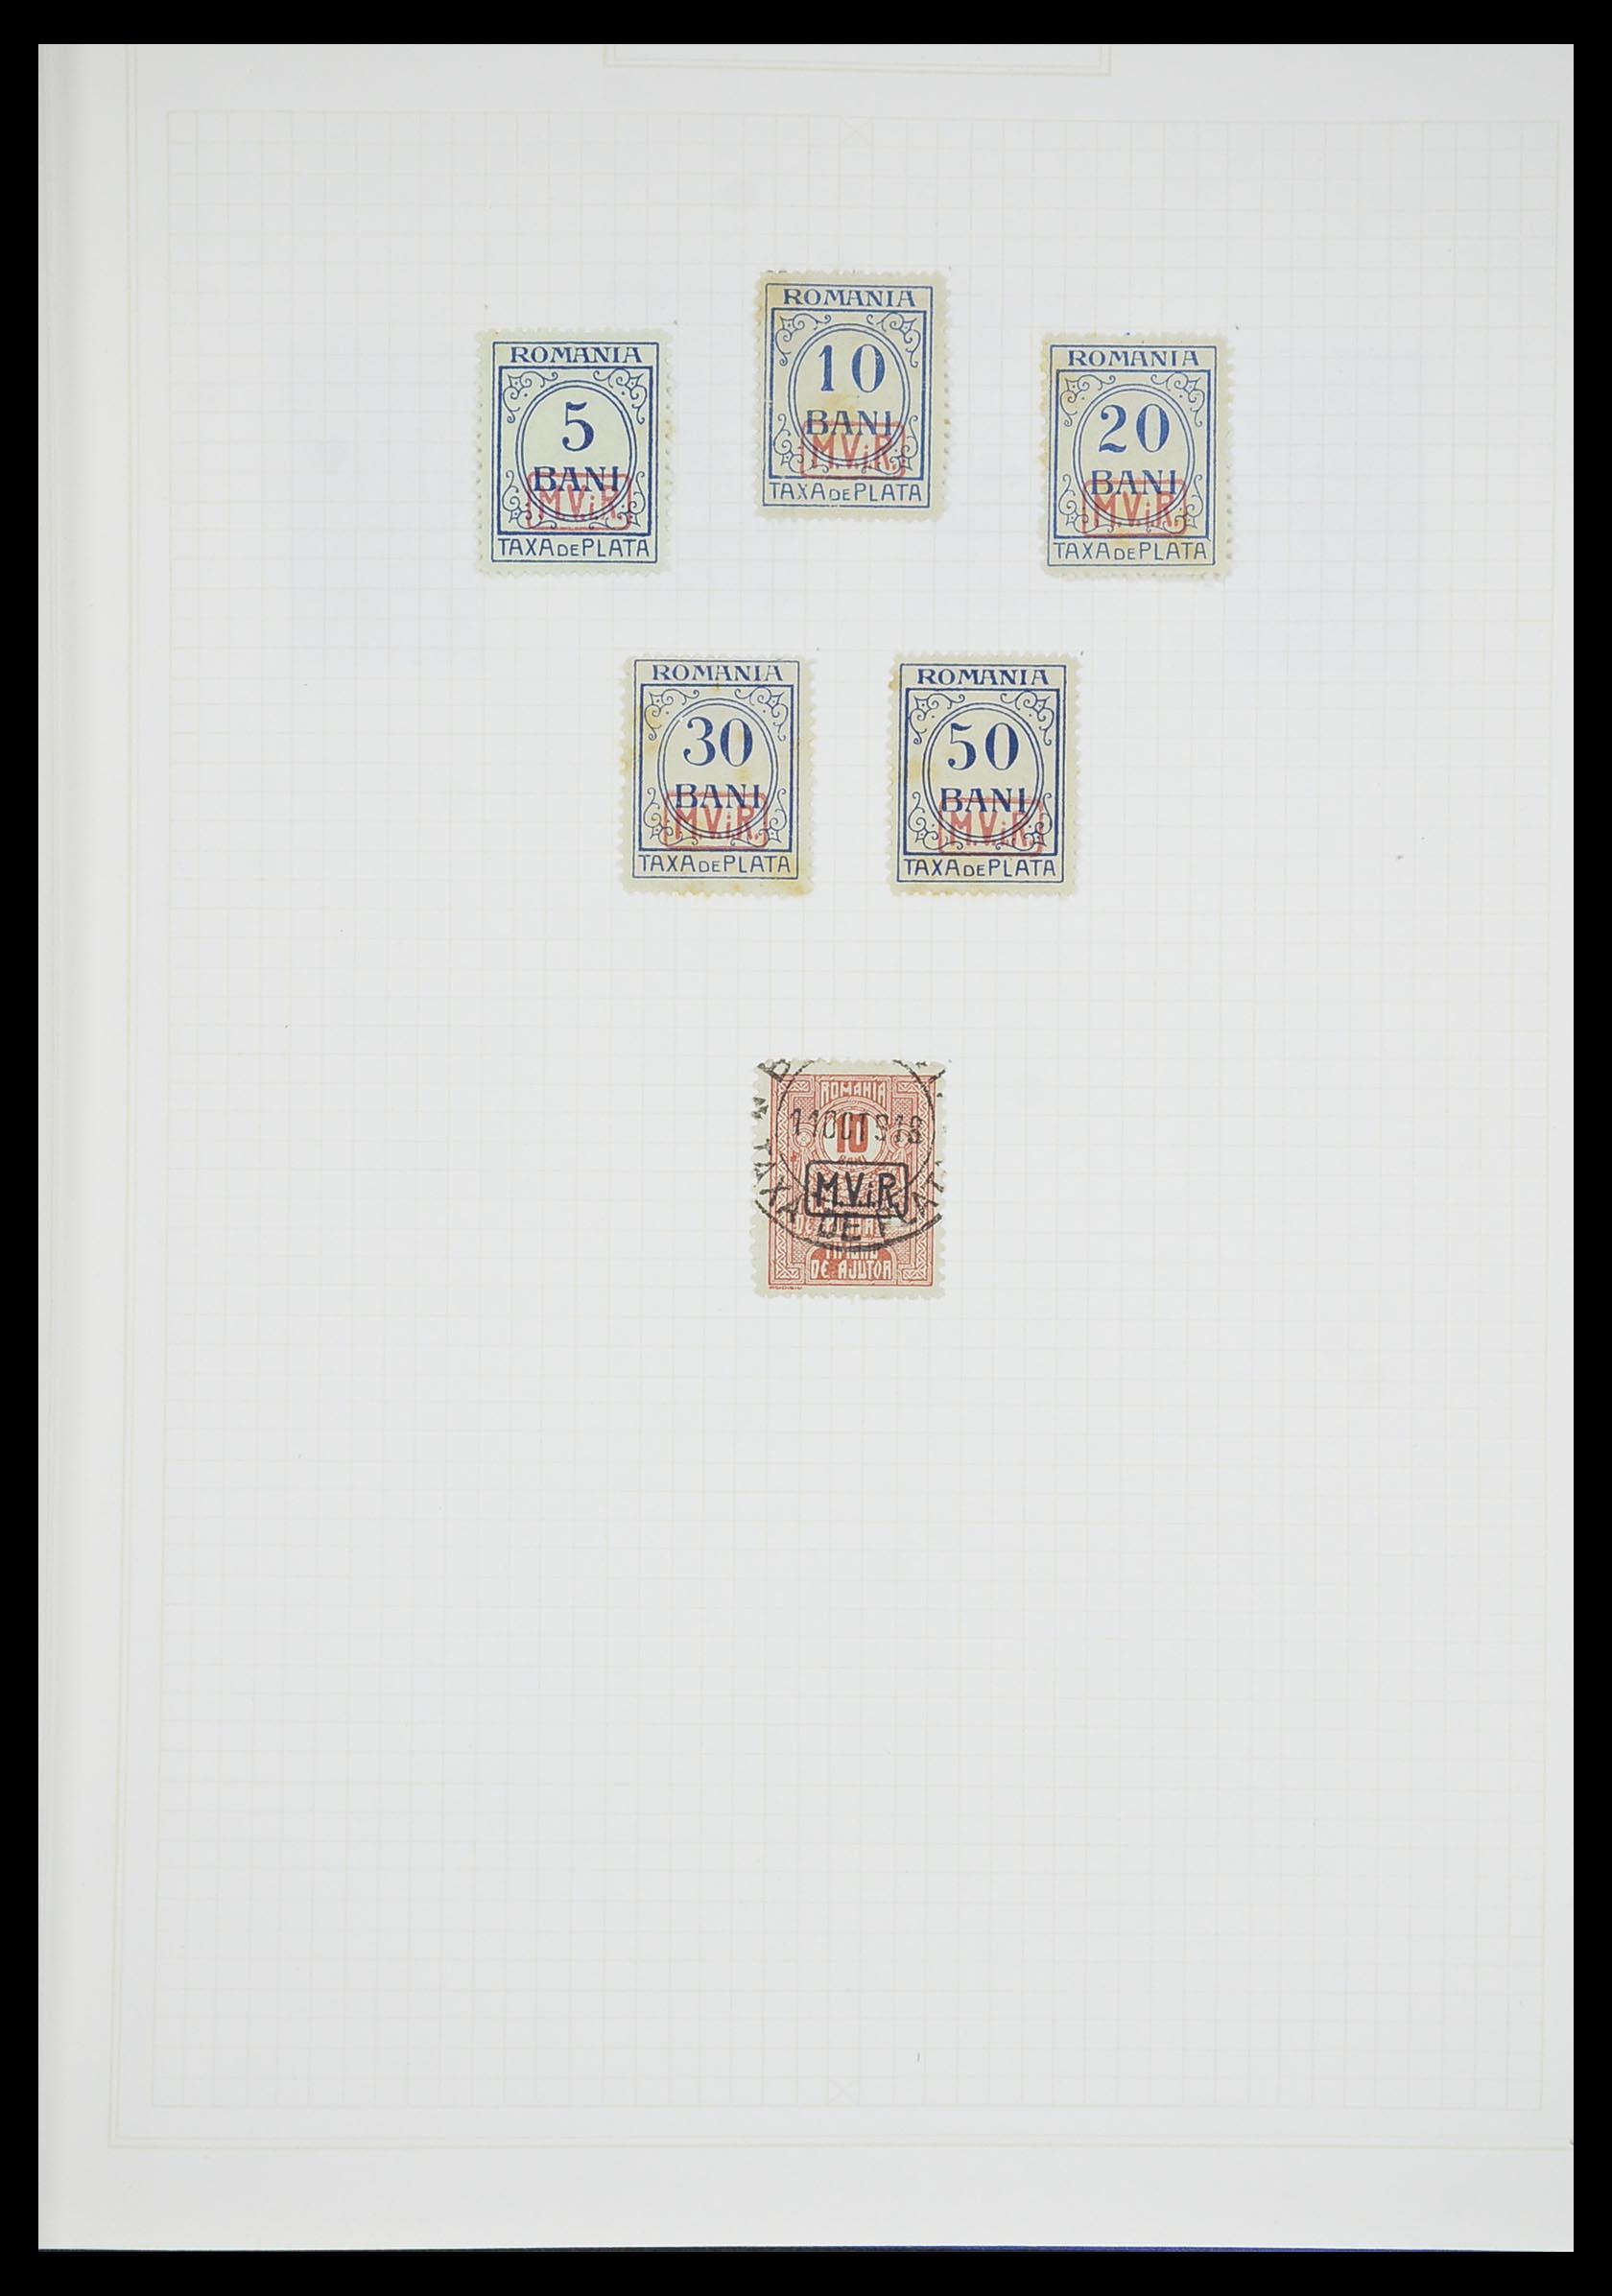 33713 010 - Postzegelverzameling 33713 Duitse bezettingen WO I en WO II 1914-1945